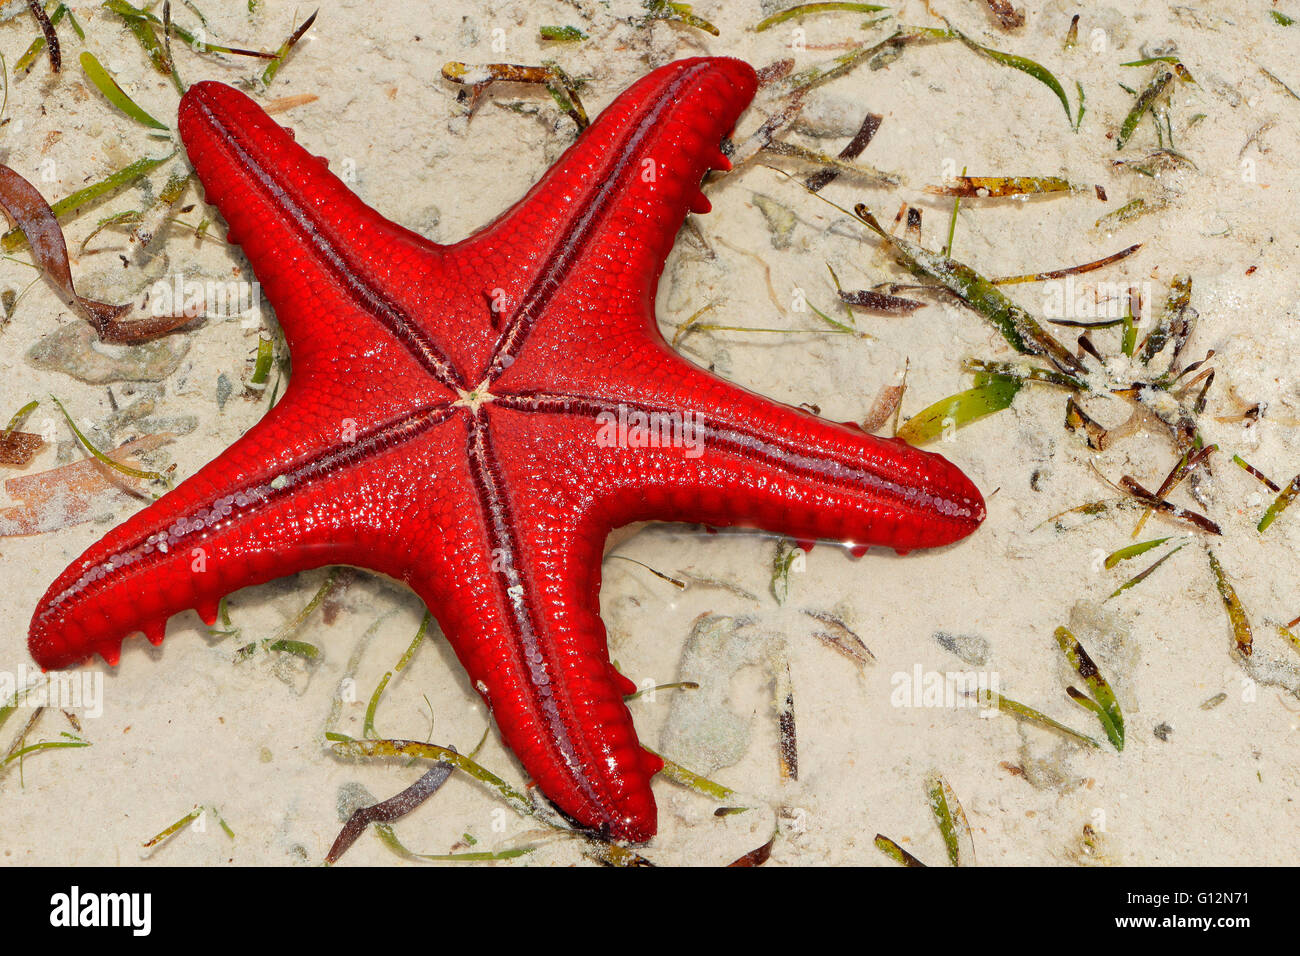 Colorful red starfish on wet sand, Zanzibar island - Stock Image